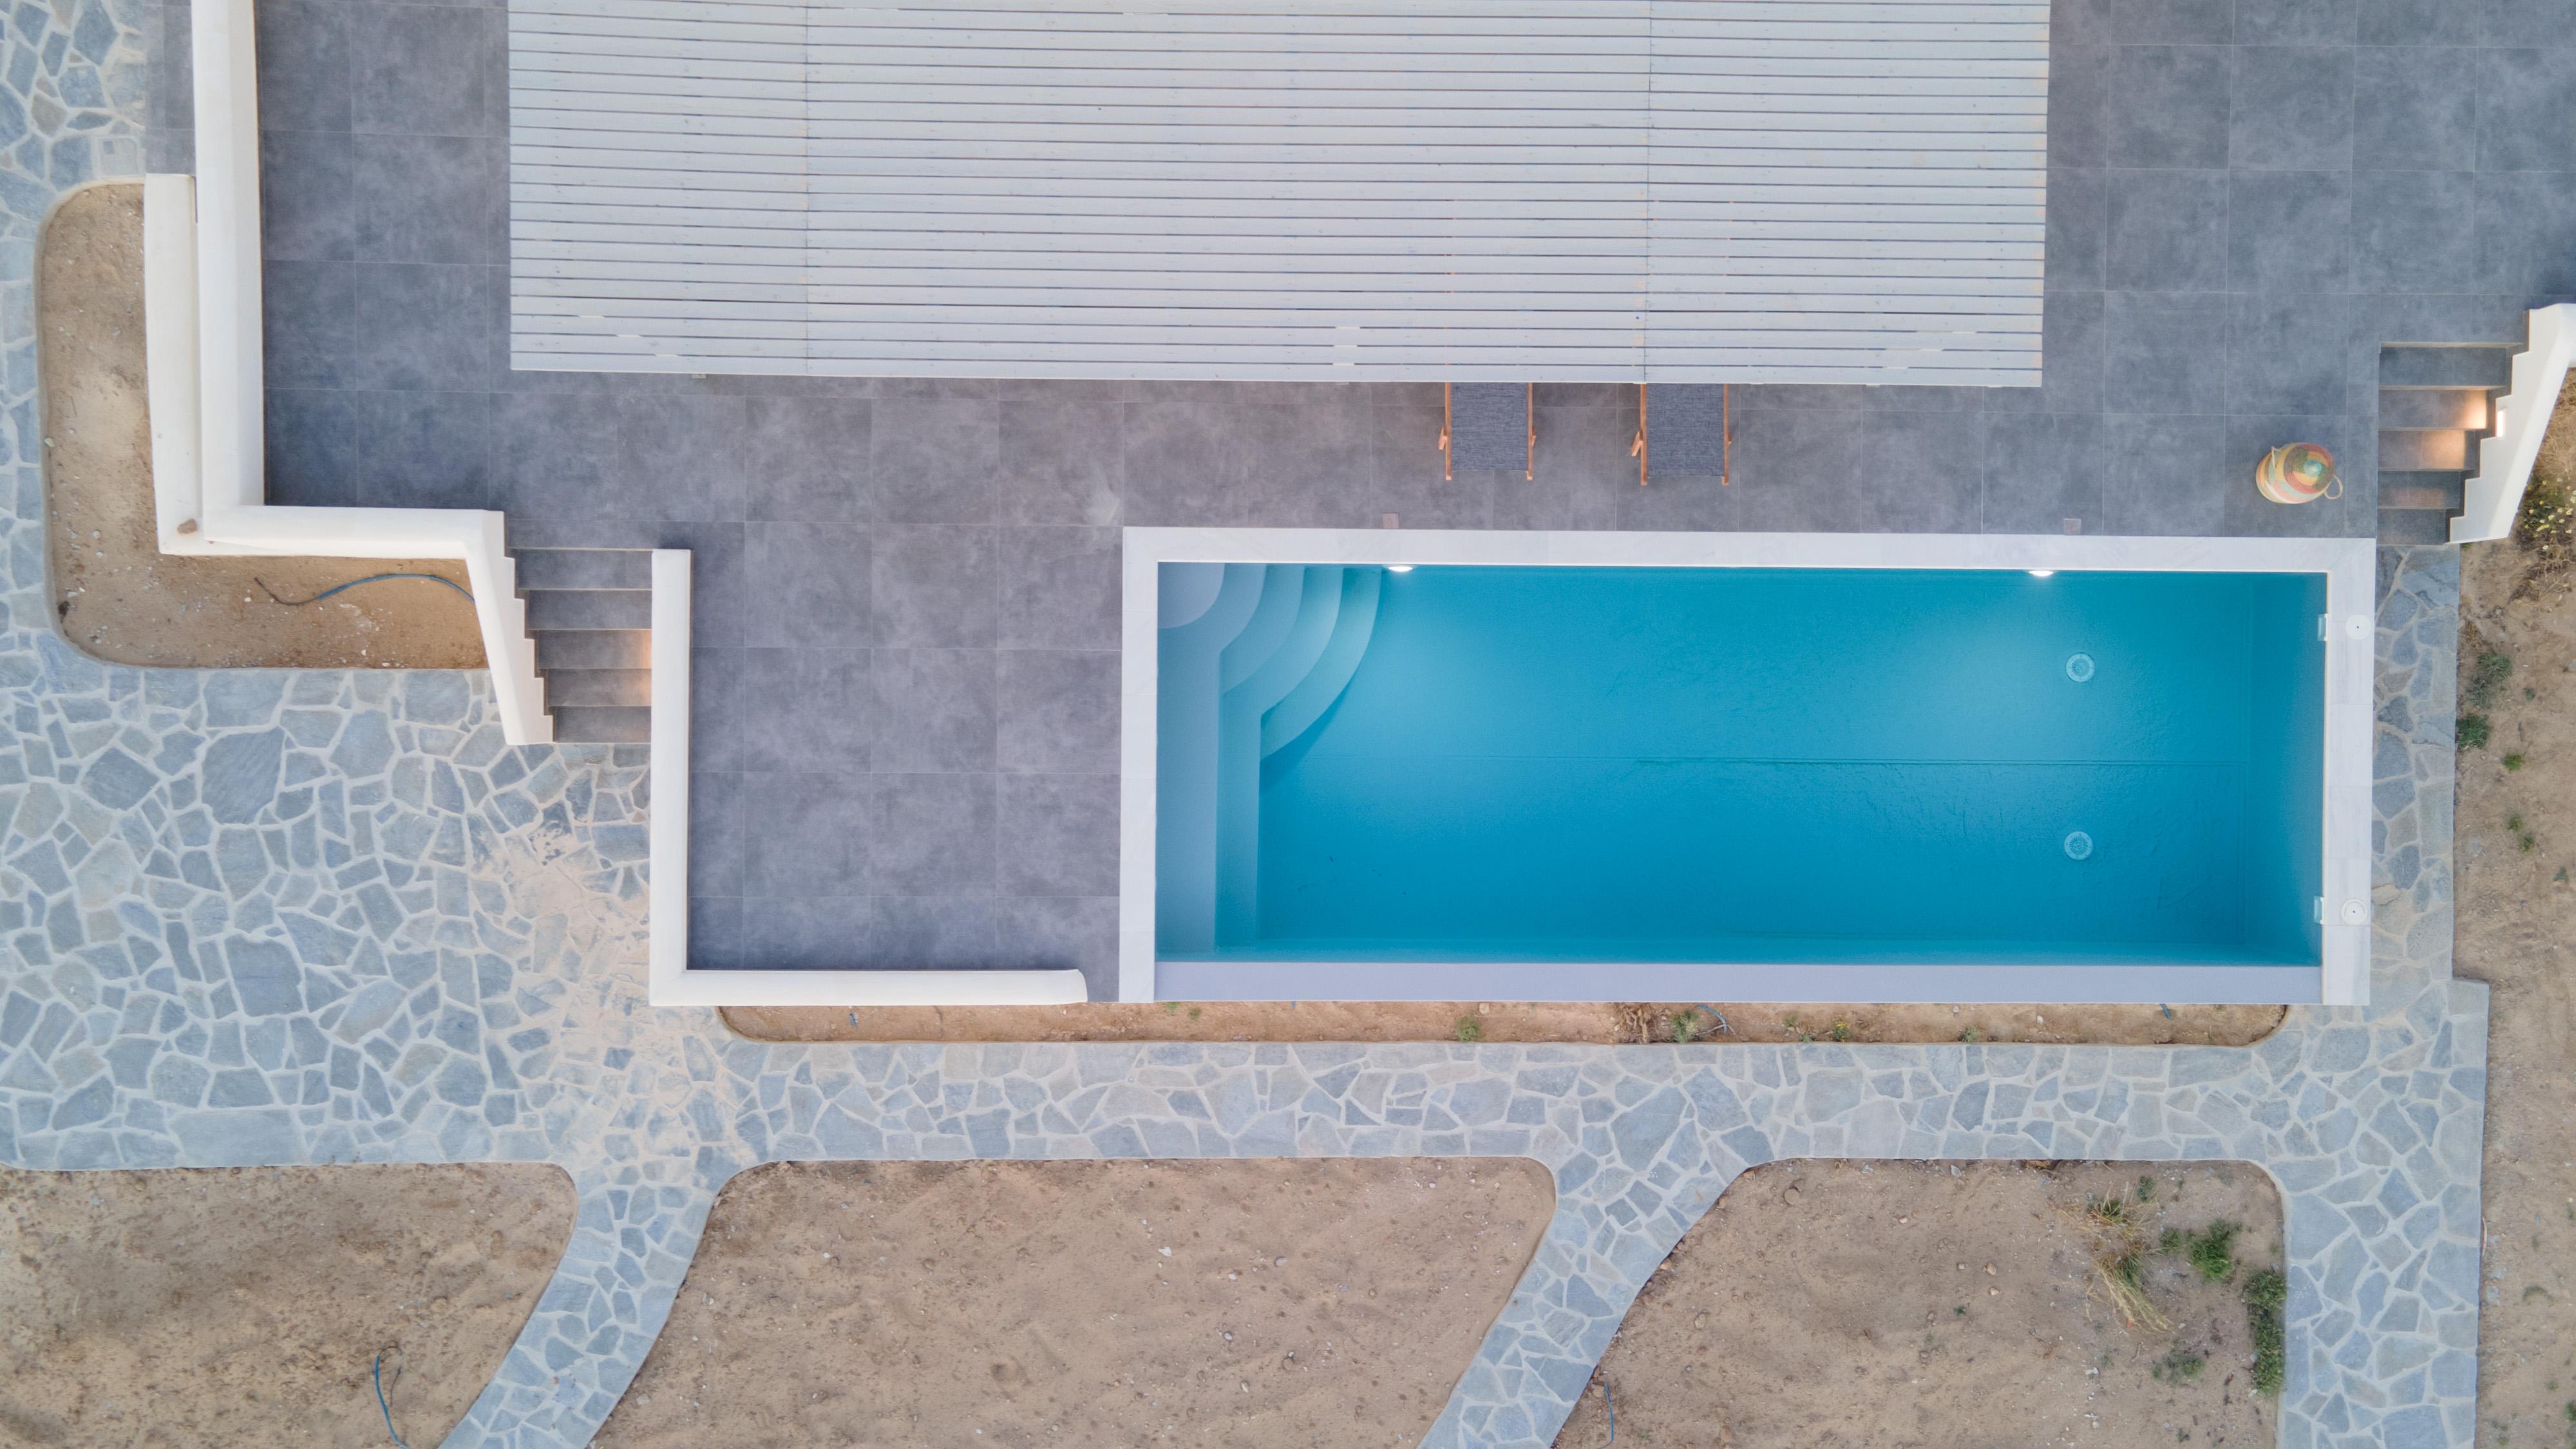 ABOVE - ABOVE - Naxos Blue & Markus Rastel 306